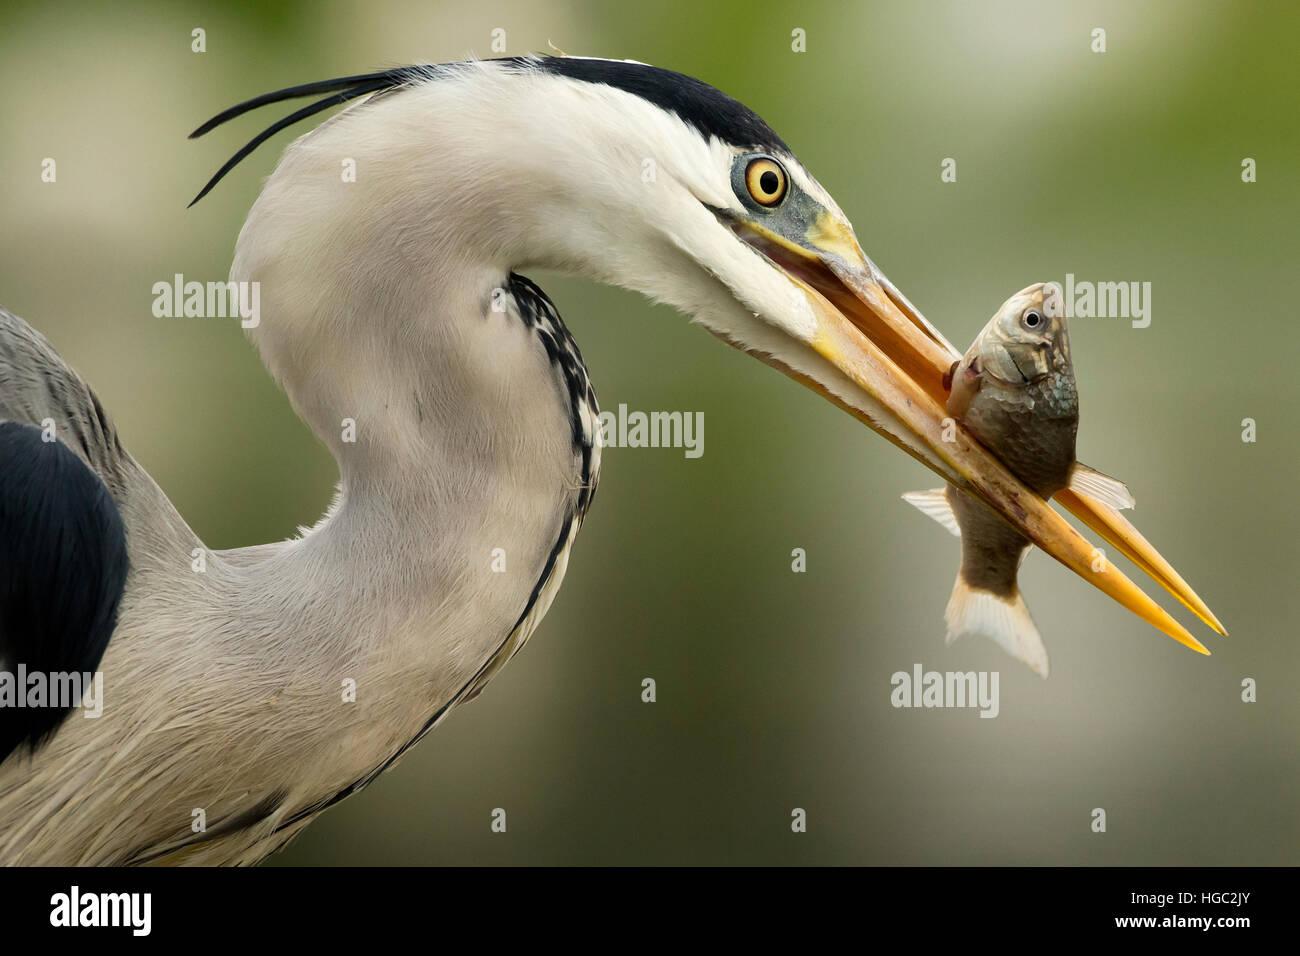 Grey heron (Ardea cinerea) catching a fish - Stock Image